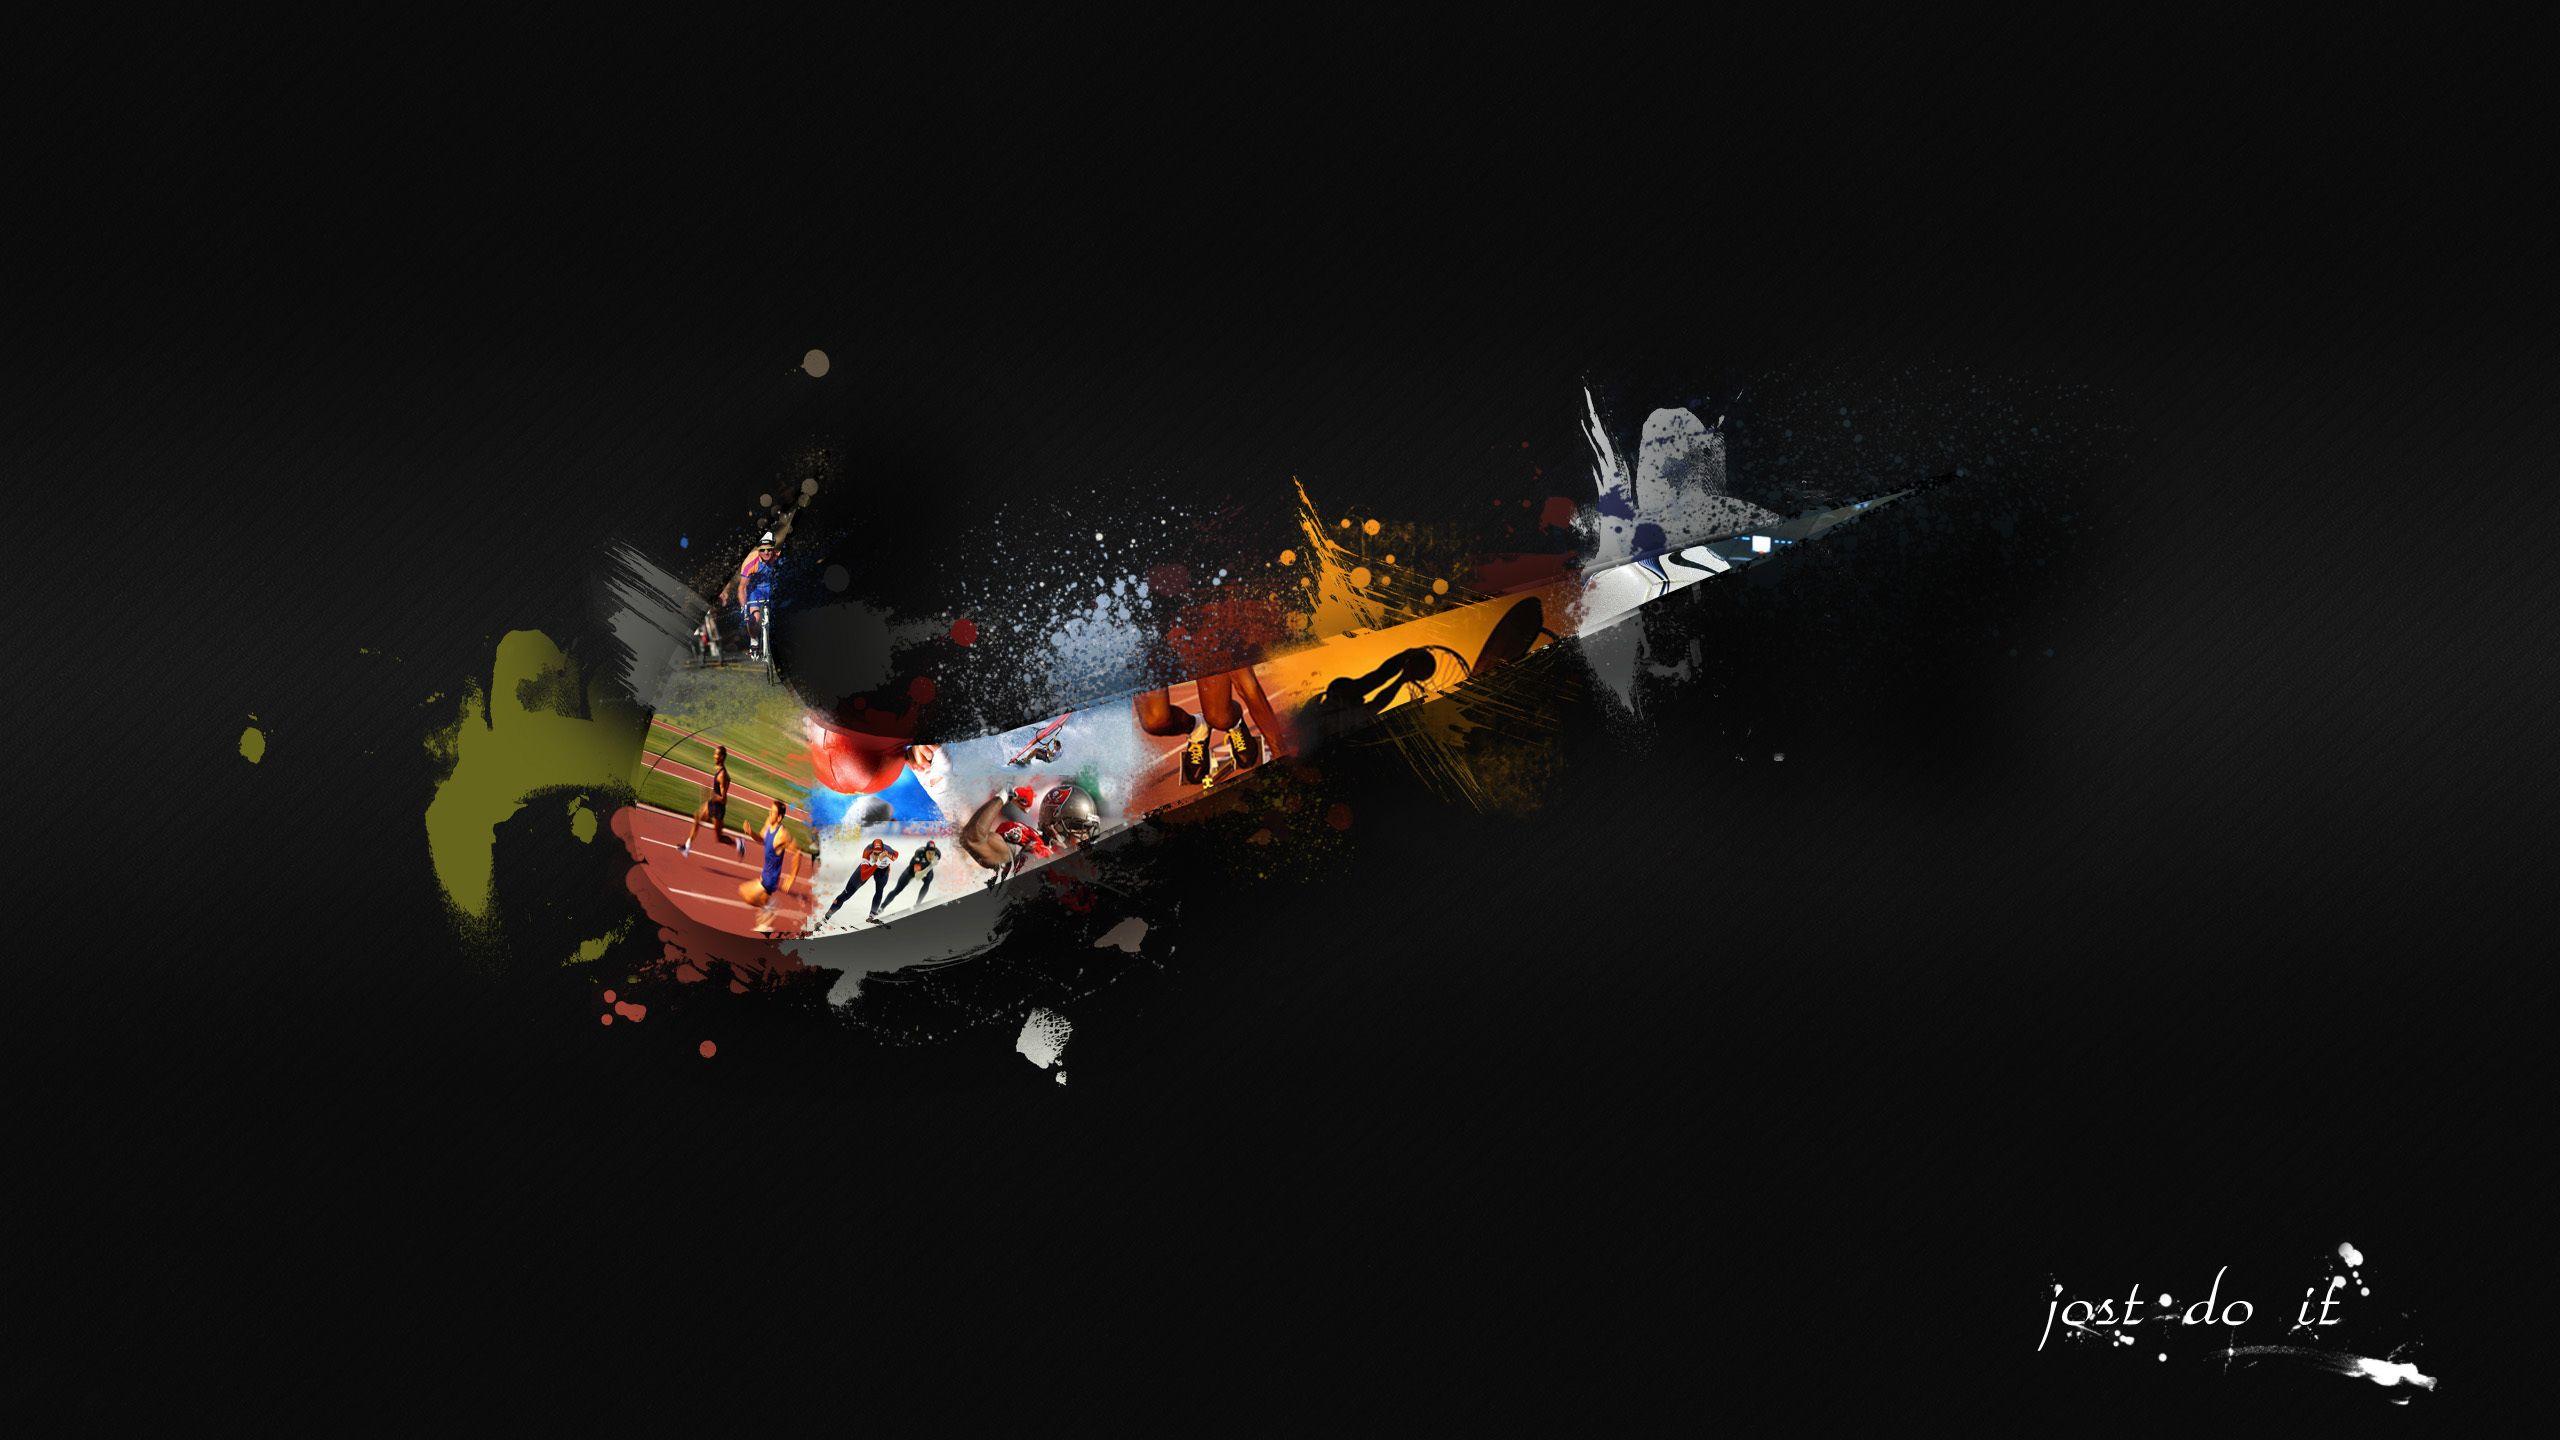 4K Nike Wallpapers   Top 4K Nike Backgrounds   WallpaperAccess 2560x1440